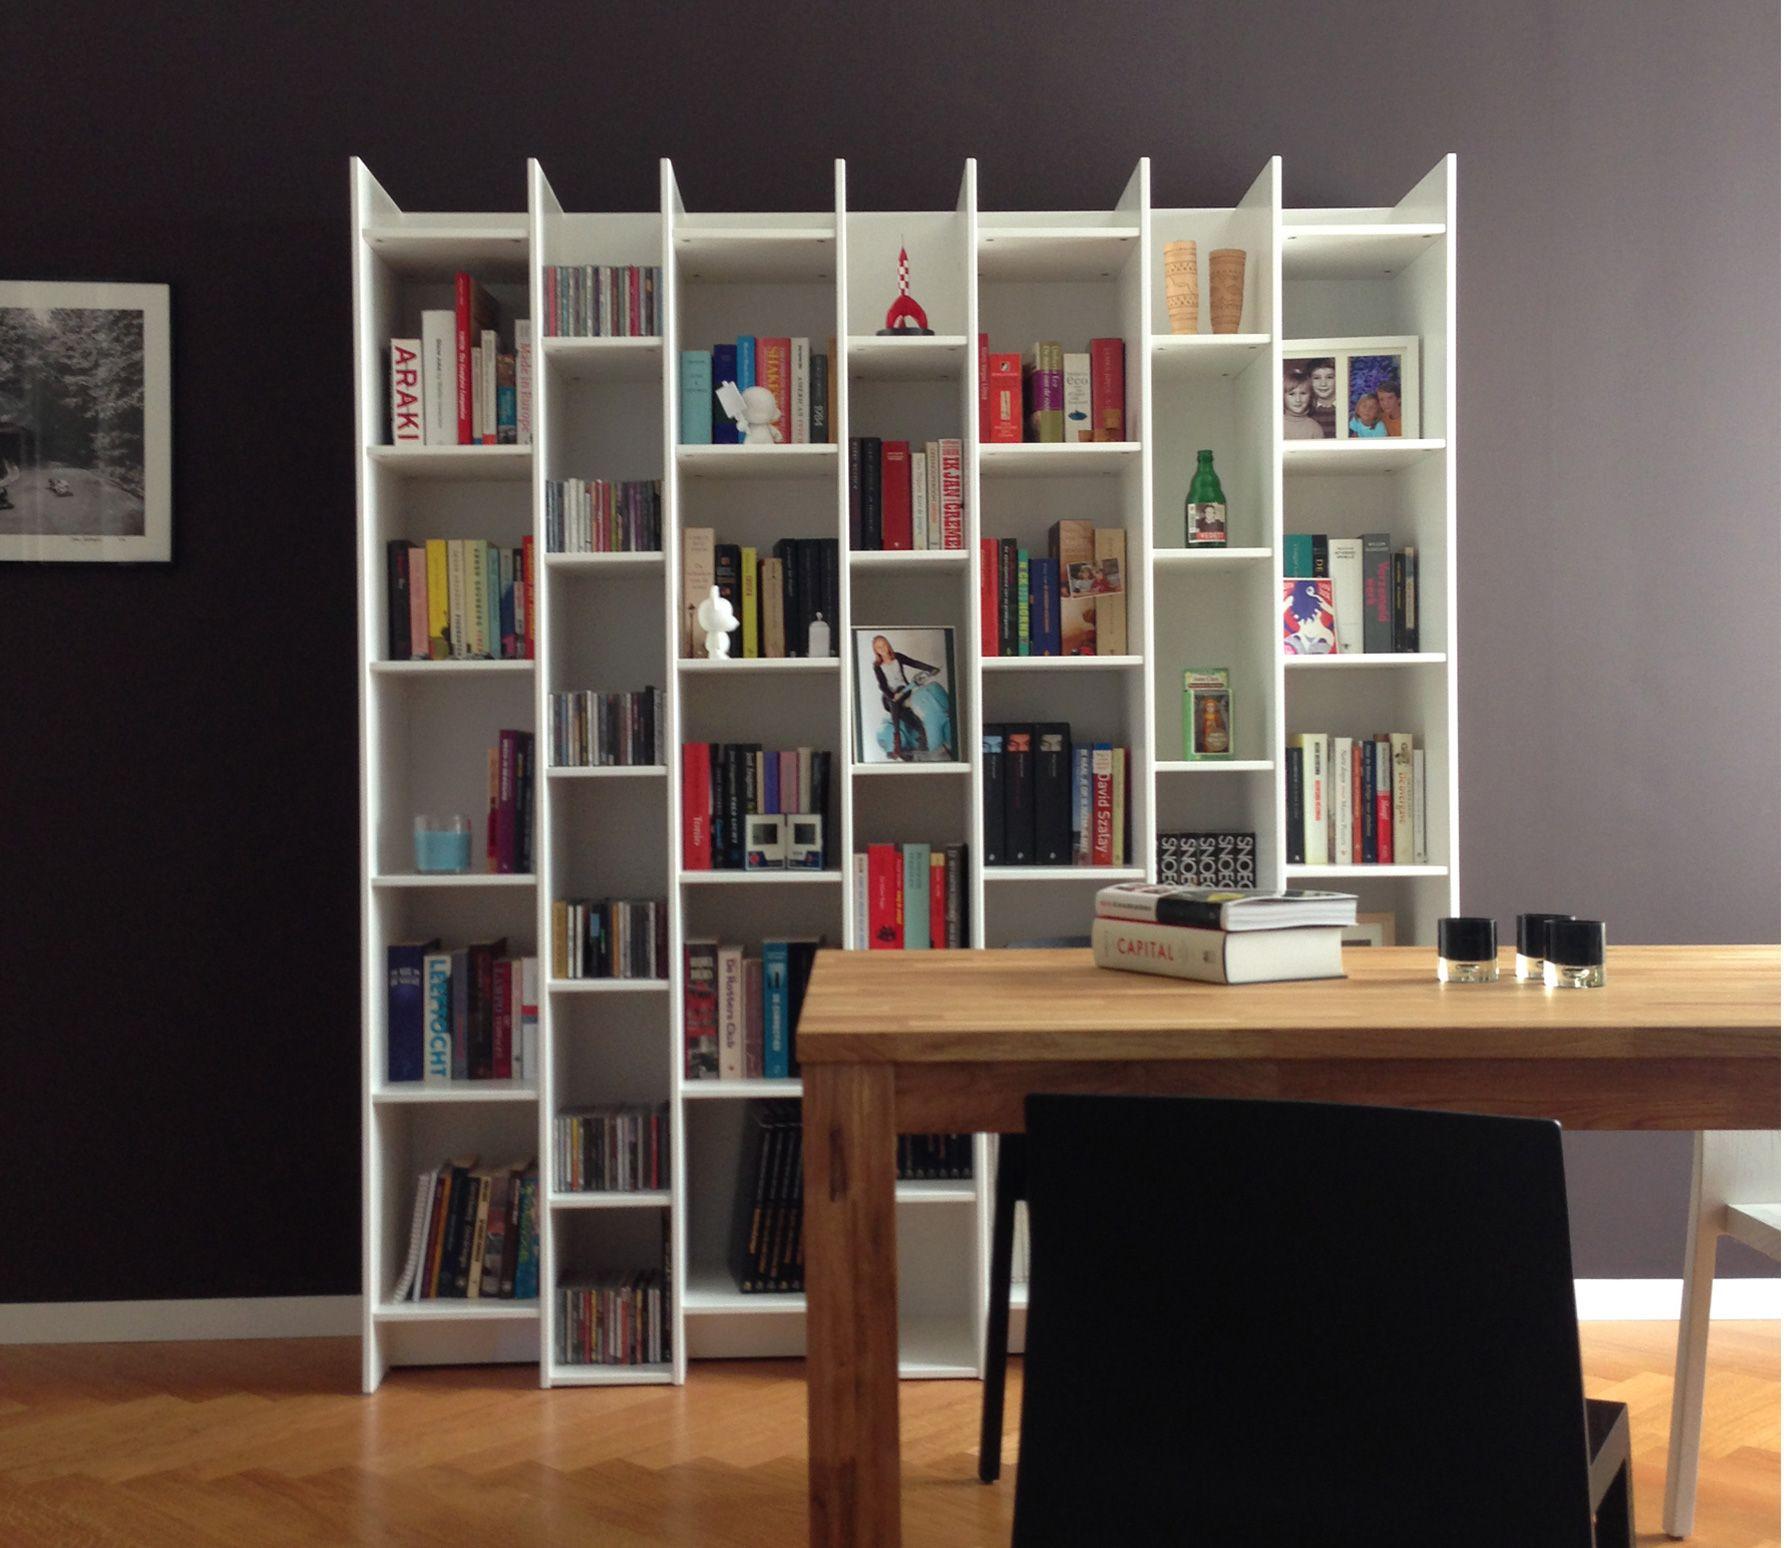 Voorbeeld van expand boekenkast vakkenkast wit grenen woood